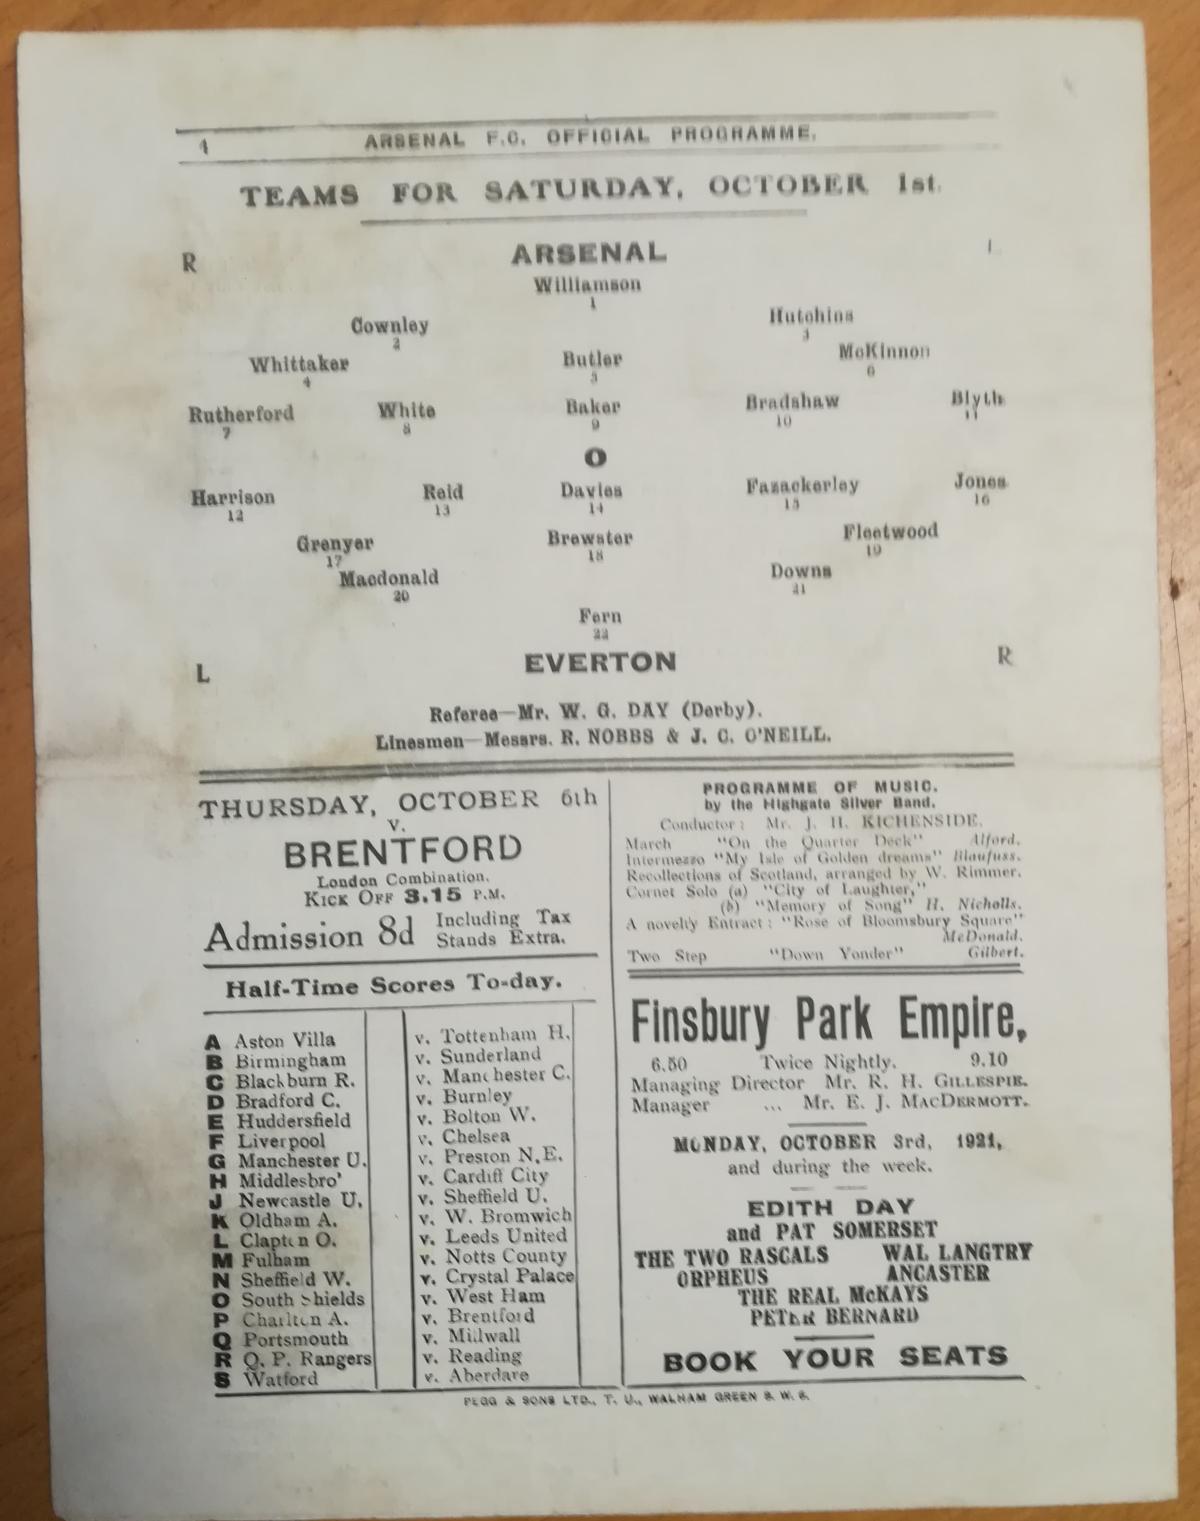 Arsenal vs Everton October 1921 Programme - Rear